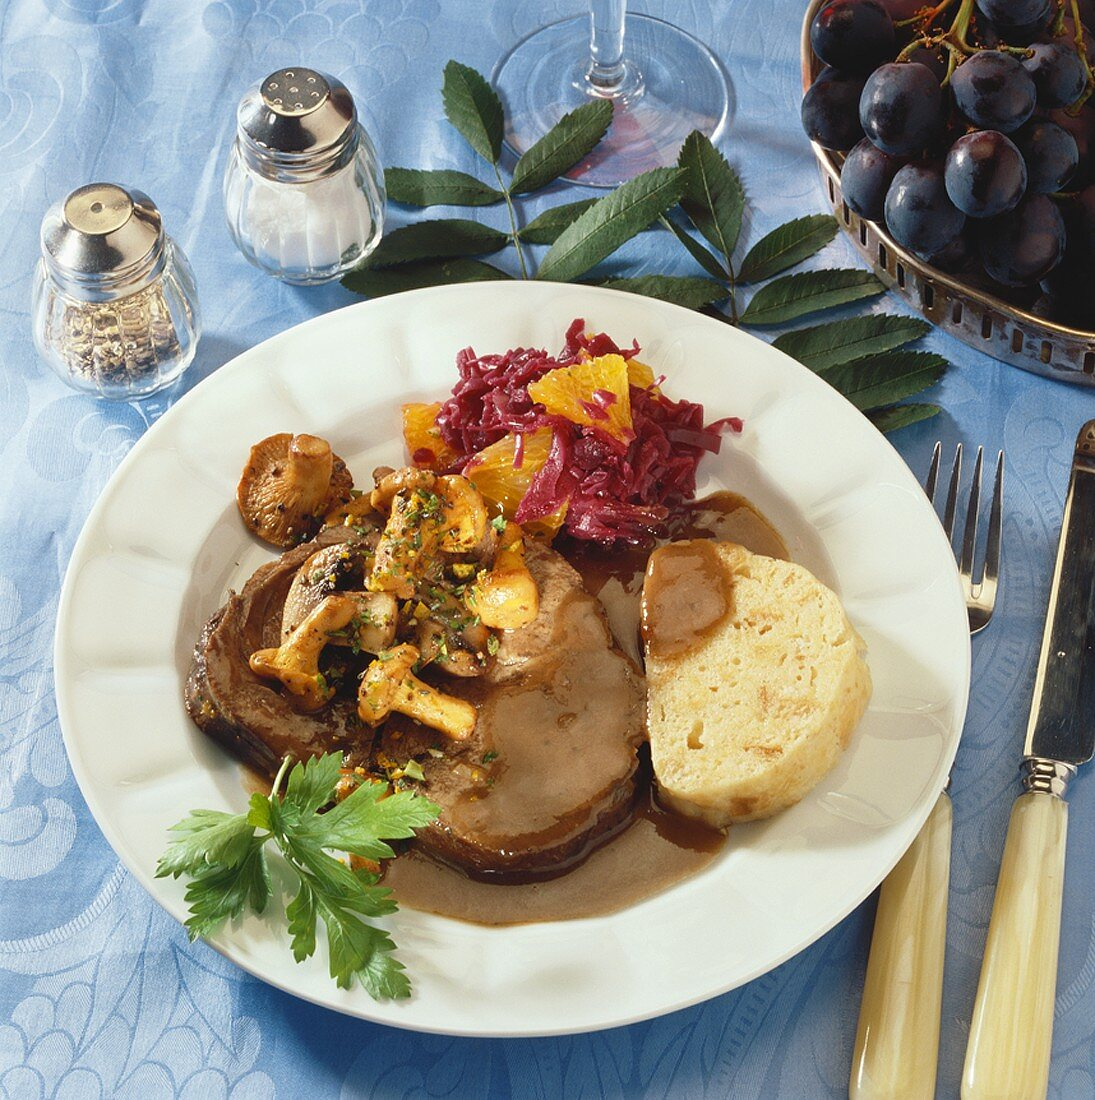 Leg of fallow deer, red wine sauce, mushrooms & napkin dumpling